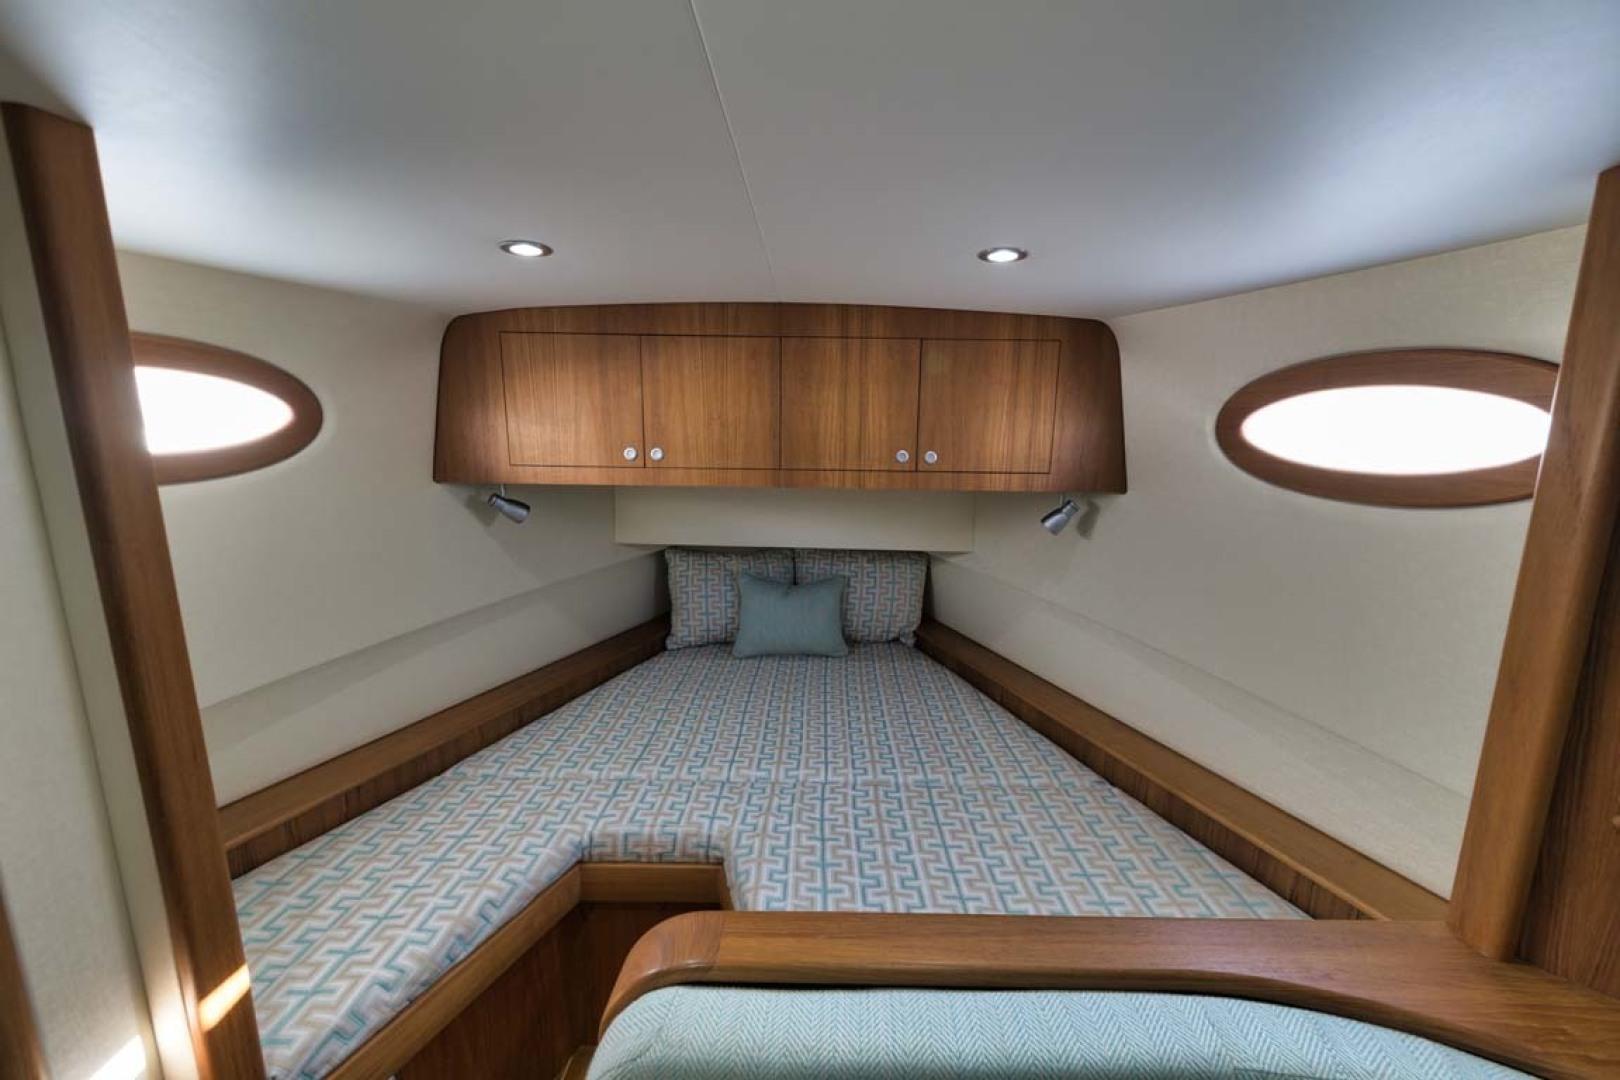 Winter Custom Yachts-46 Walkaround 2019-Family Circus Stuart-Florida-United States-V-Berth with Storage Below and Overhead Storage Lockers-1563744 | Thumbnail